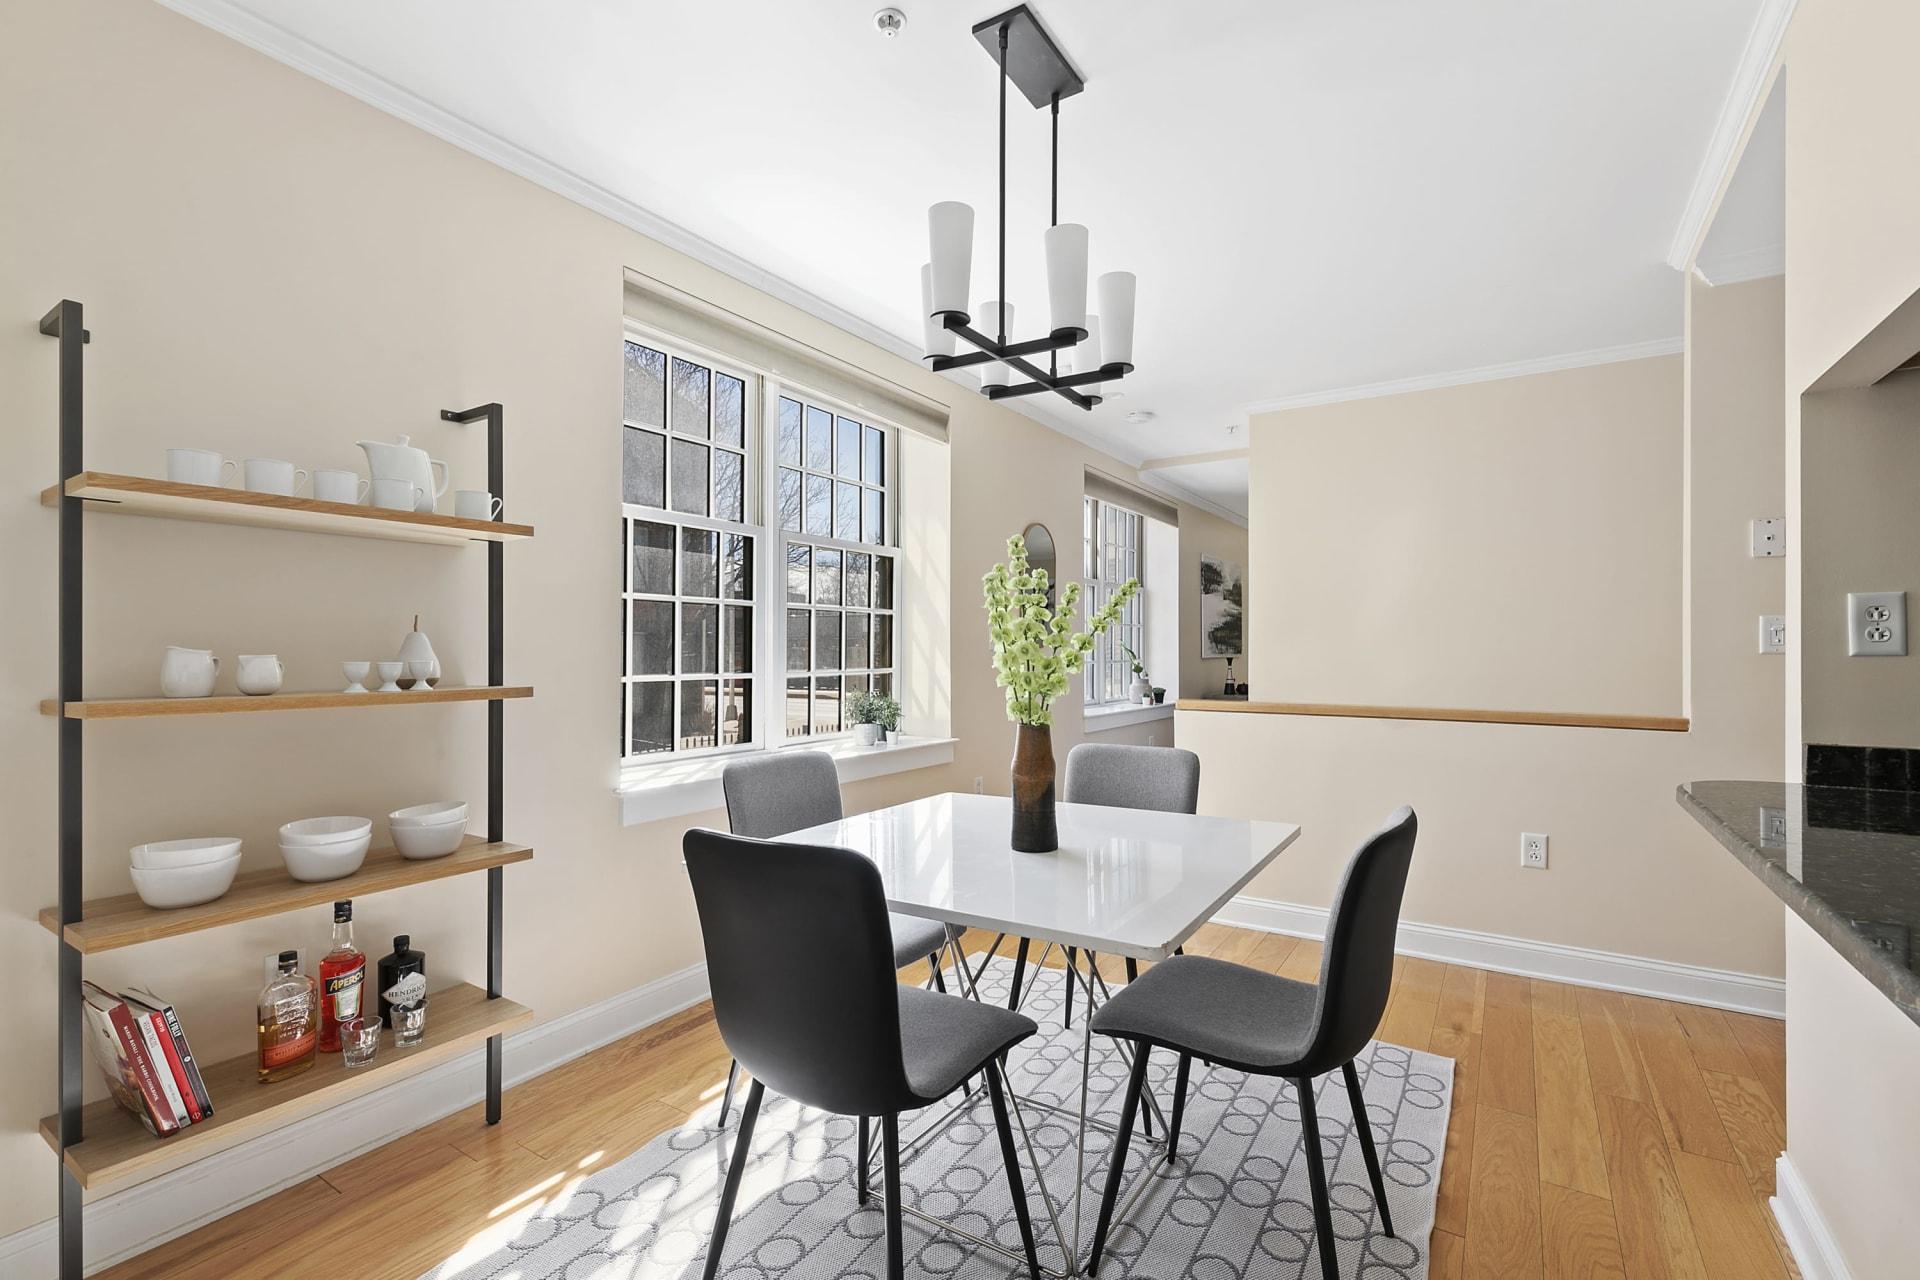 1 Russell Street, Unit 101—Cambridge Luxury Condo photo